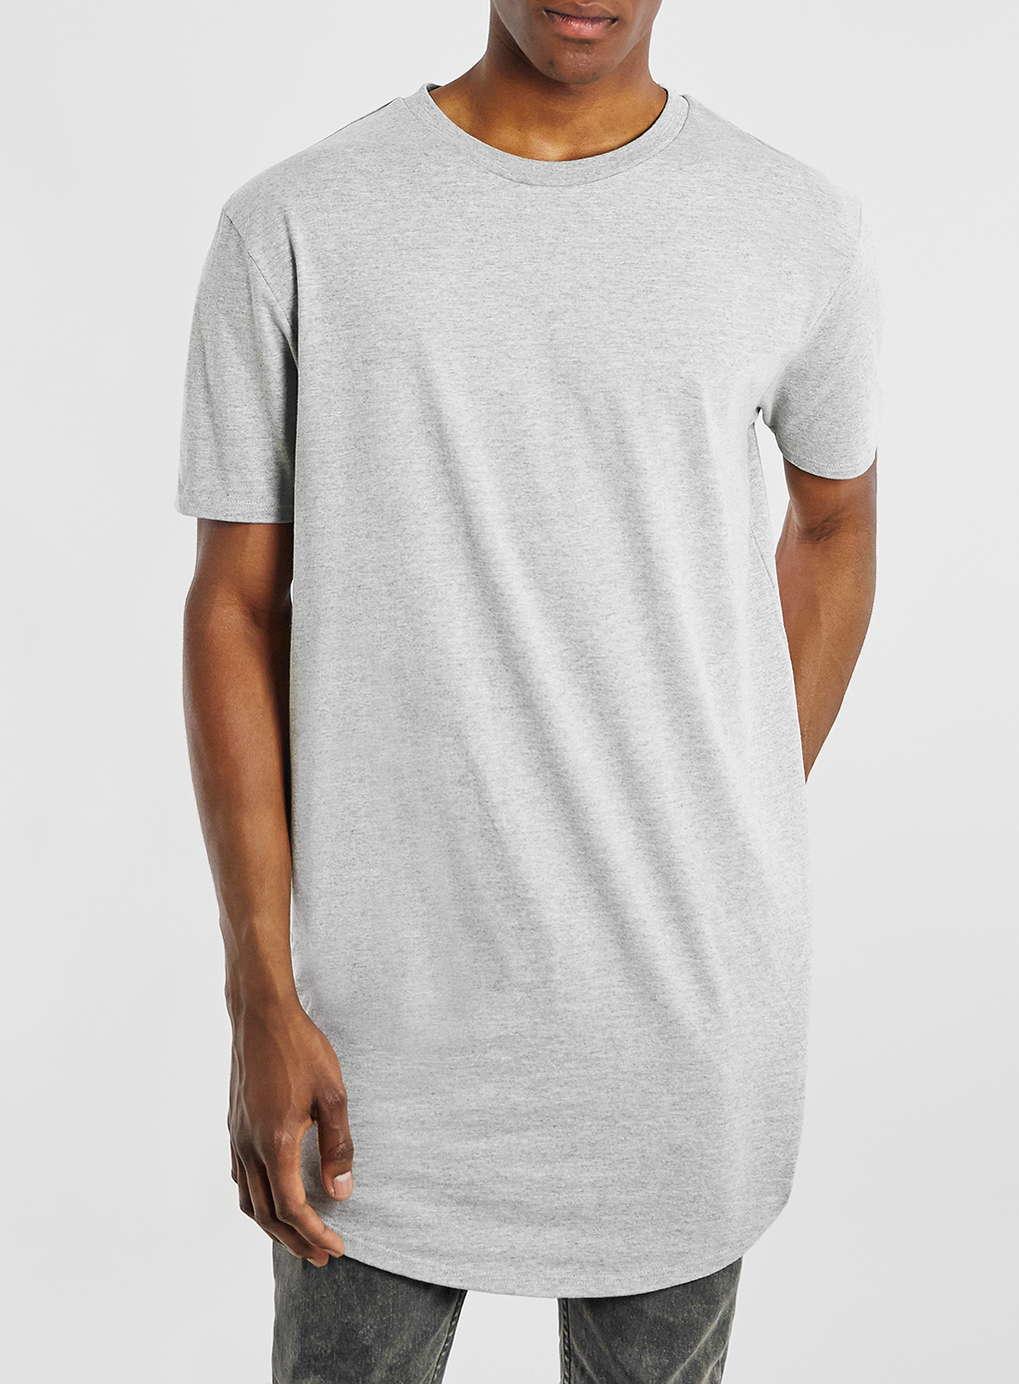 Topman grey marl long line t shirt in gray for men mid for Grey marl t shirt